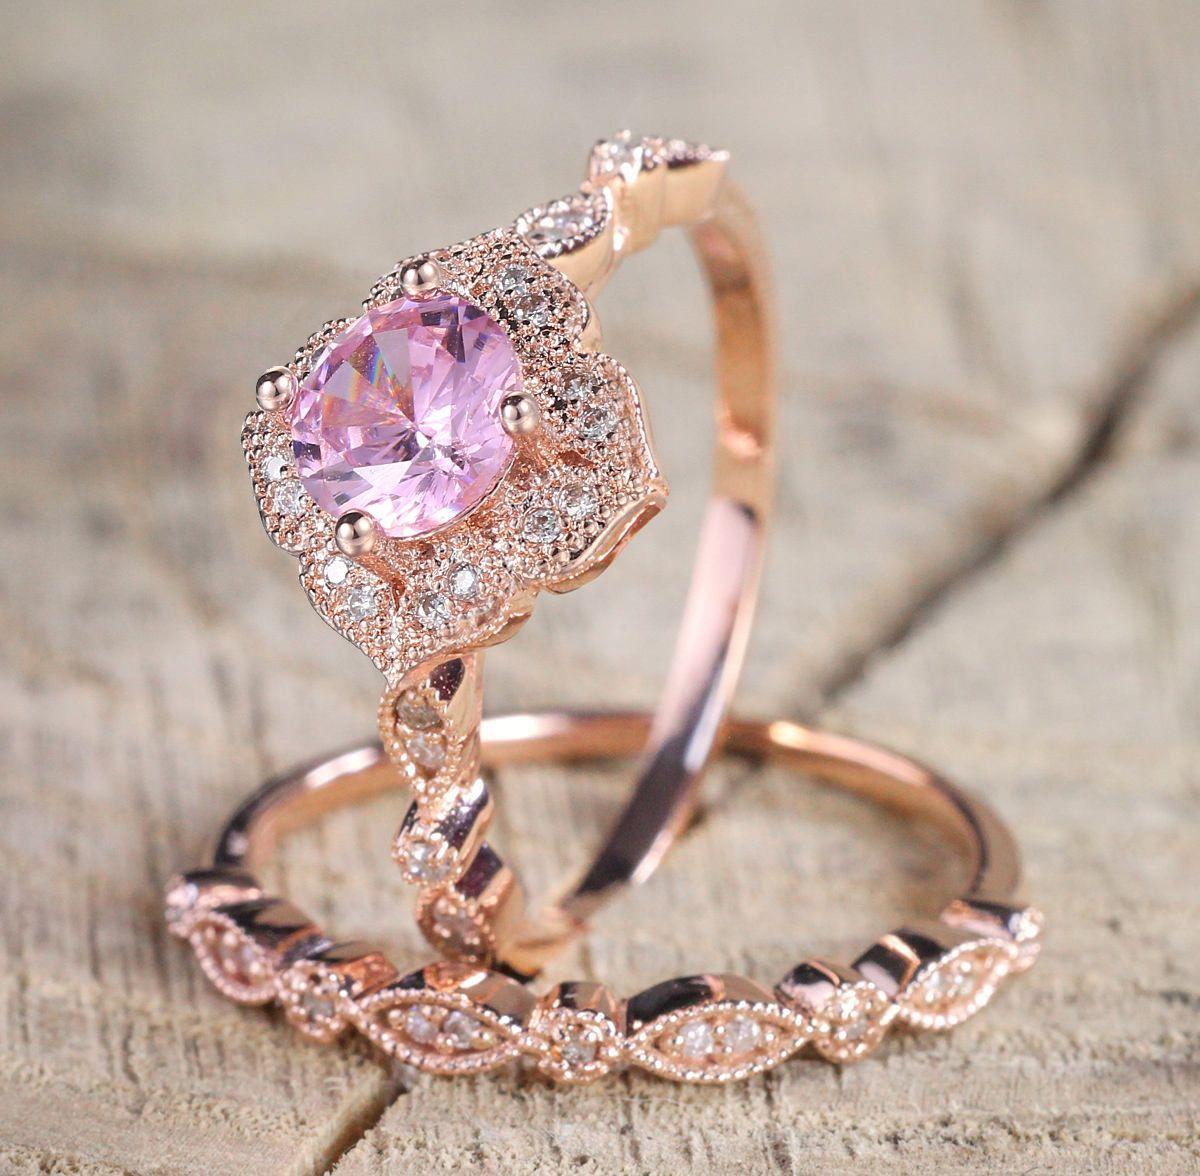 Doppelmesse süße Prinzessin Ring Set für Frauen Rosa Zirkonia Rose Gold Farbe 2 PCS Brautmode Schmuck KAR244 KAR271